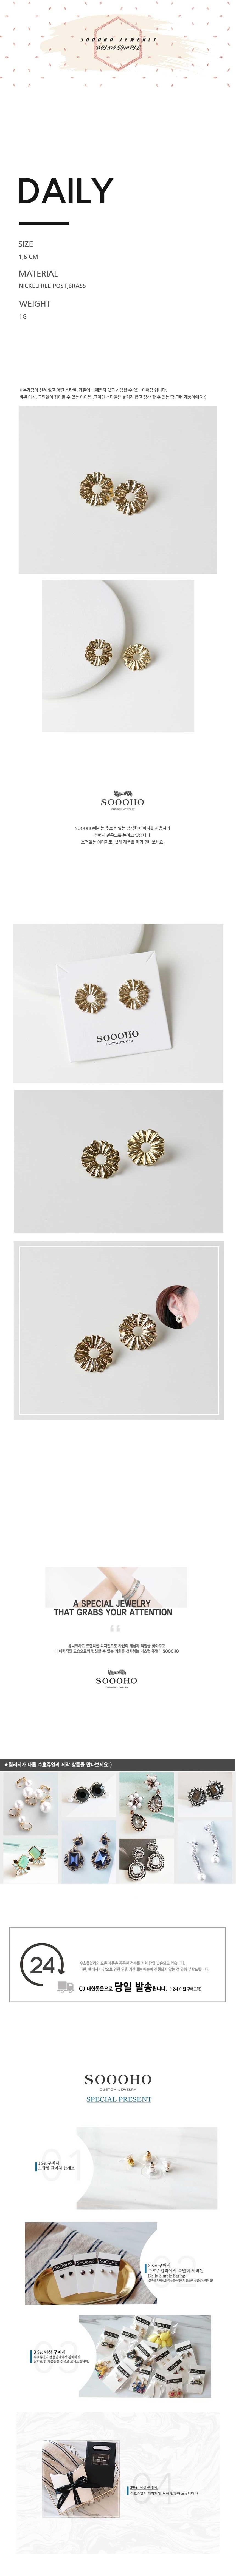 daily 데일리 골드 귀걸이 - 수호쥬얼리, 9,500원, 골드, 볼/미니귀걸이